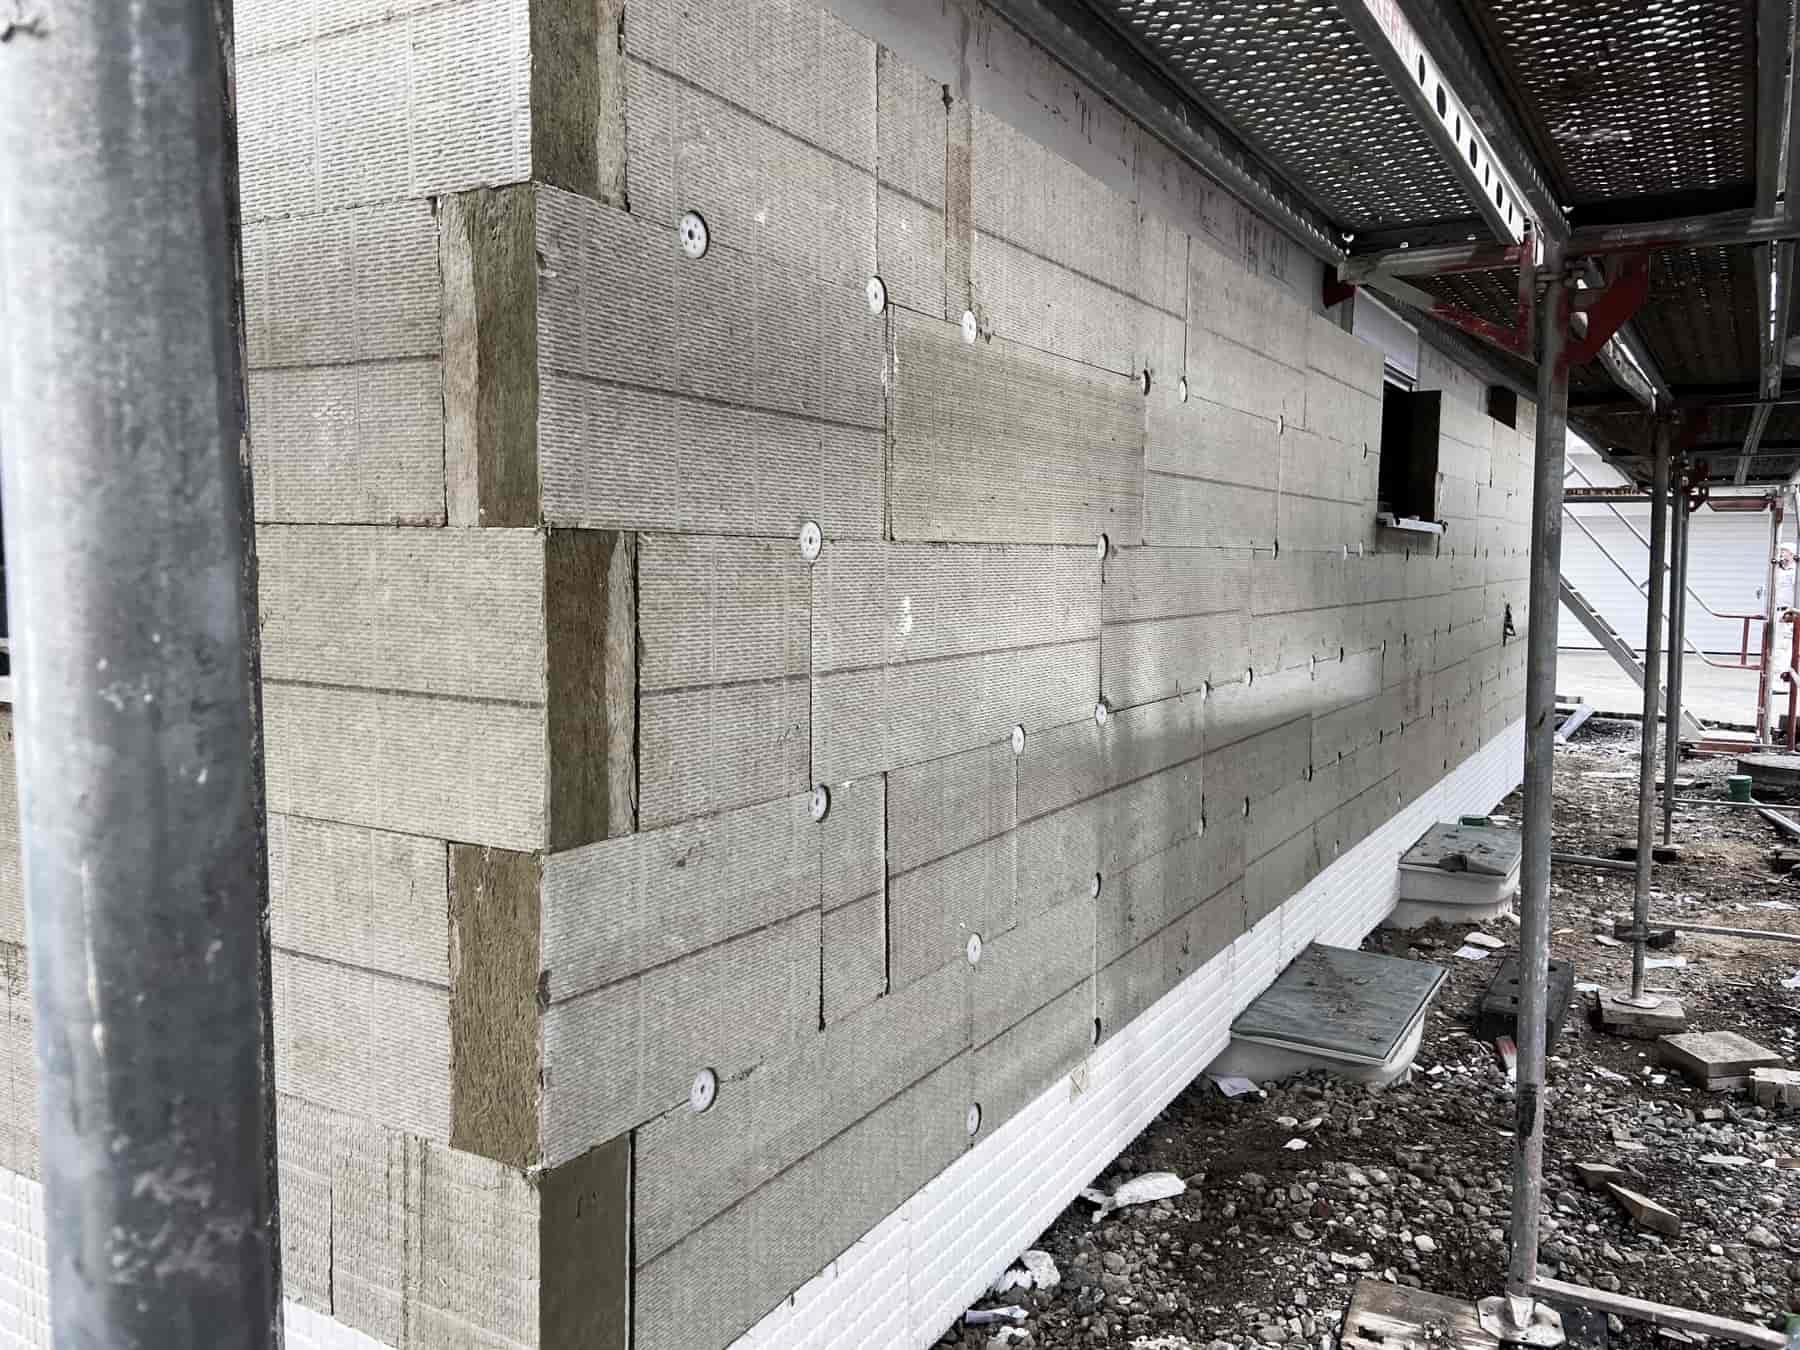 Ingenieurbüro Nebel - Ingenieurbüro Mespelbrunn - Projekt - Mehrfamilienhaus Hofheim